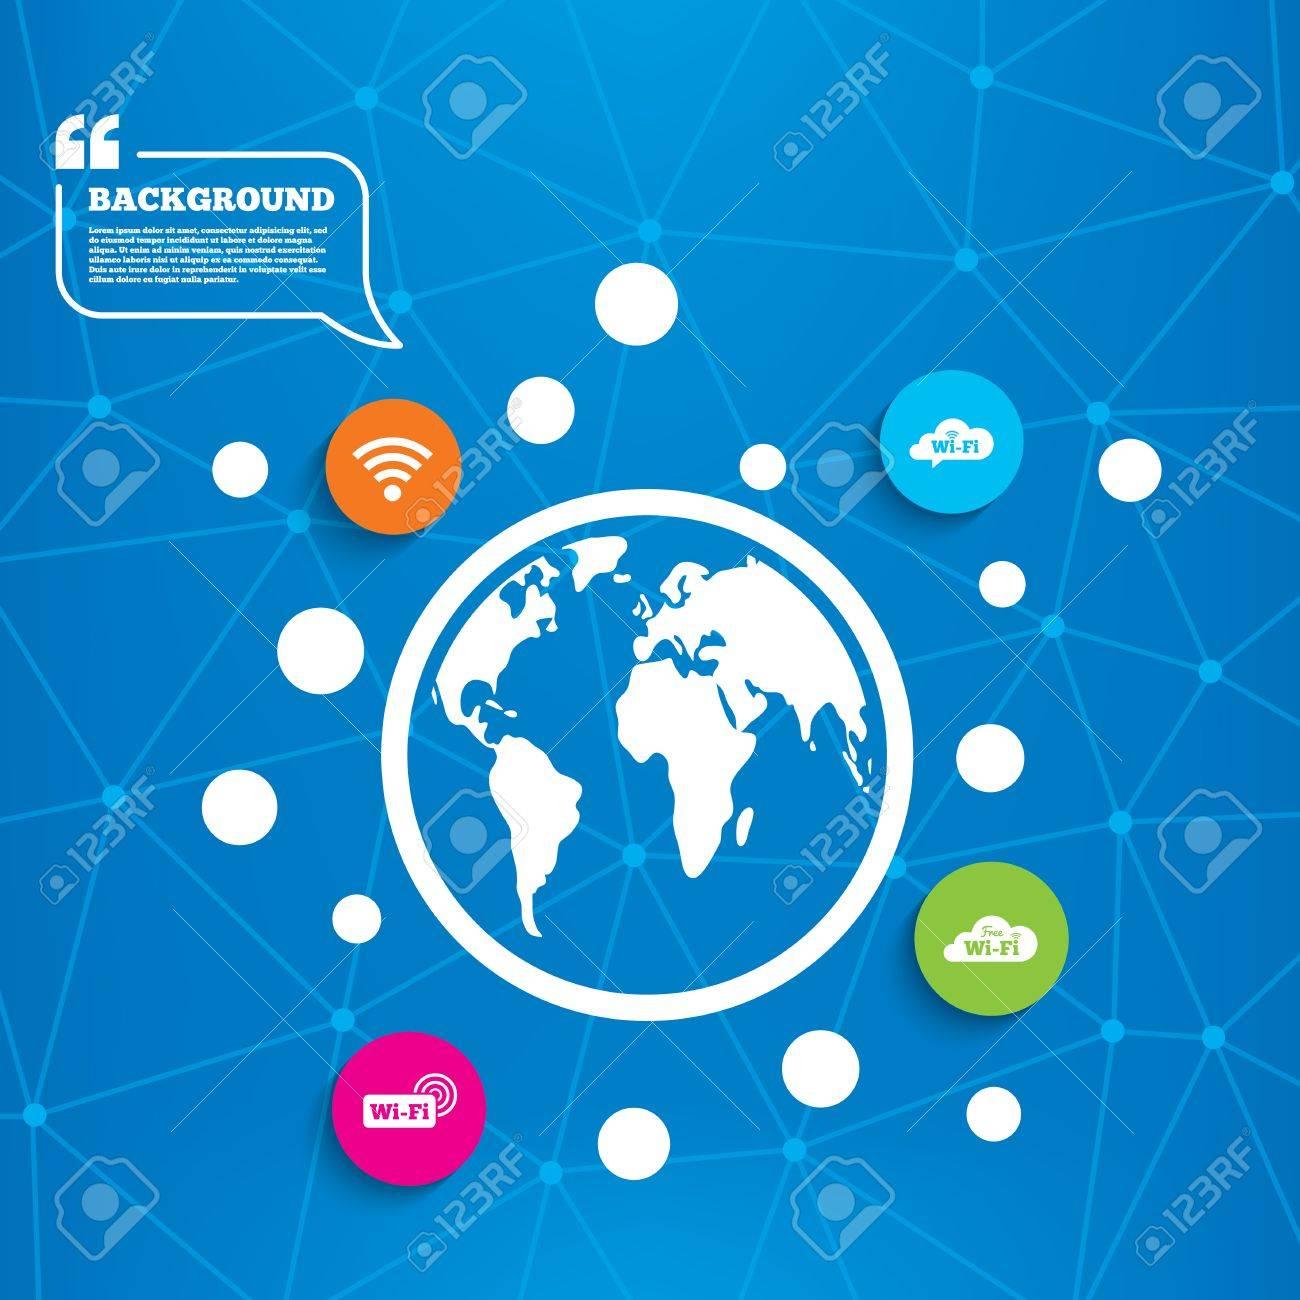 abstract world globe free wifi wireless network cloud speech